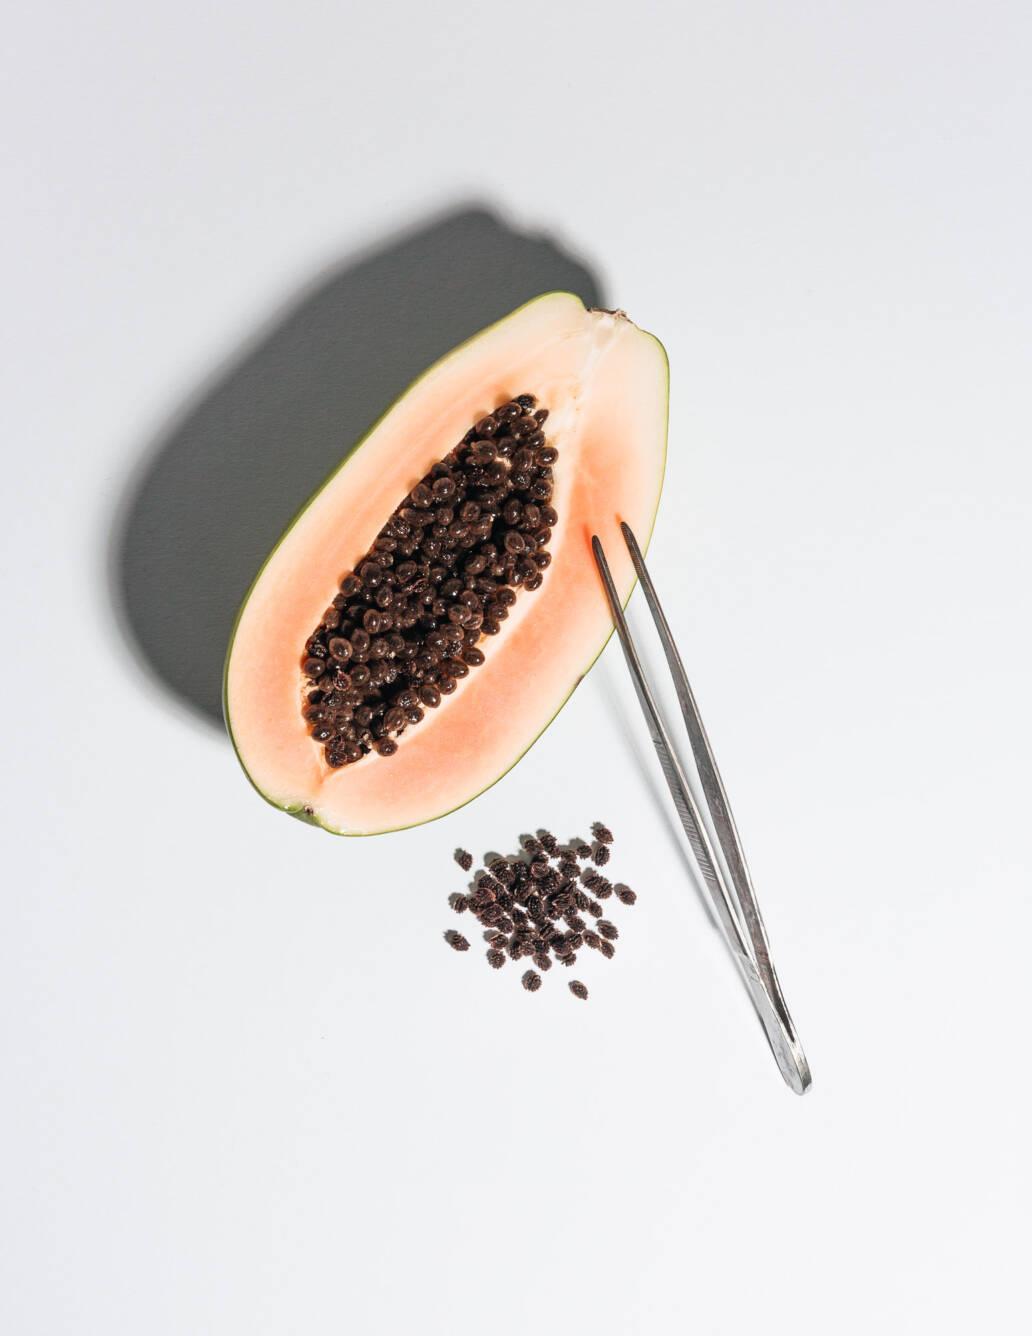 Food Fraud – Editorial Still Life Photography – Fake Pepper